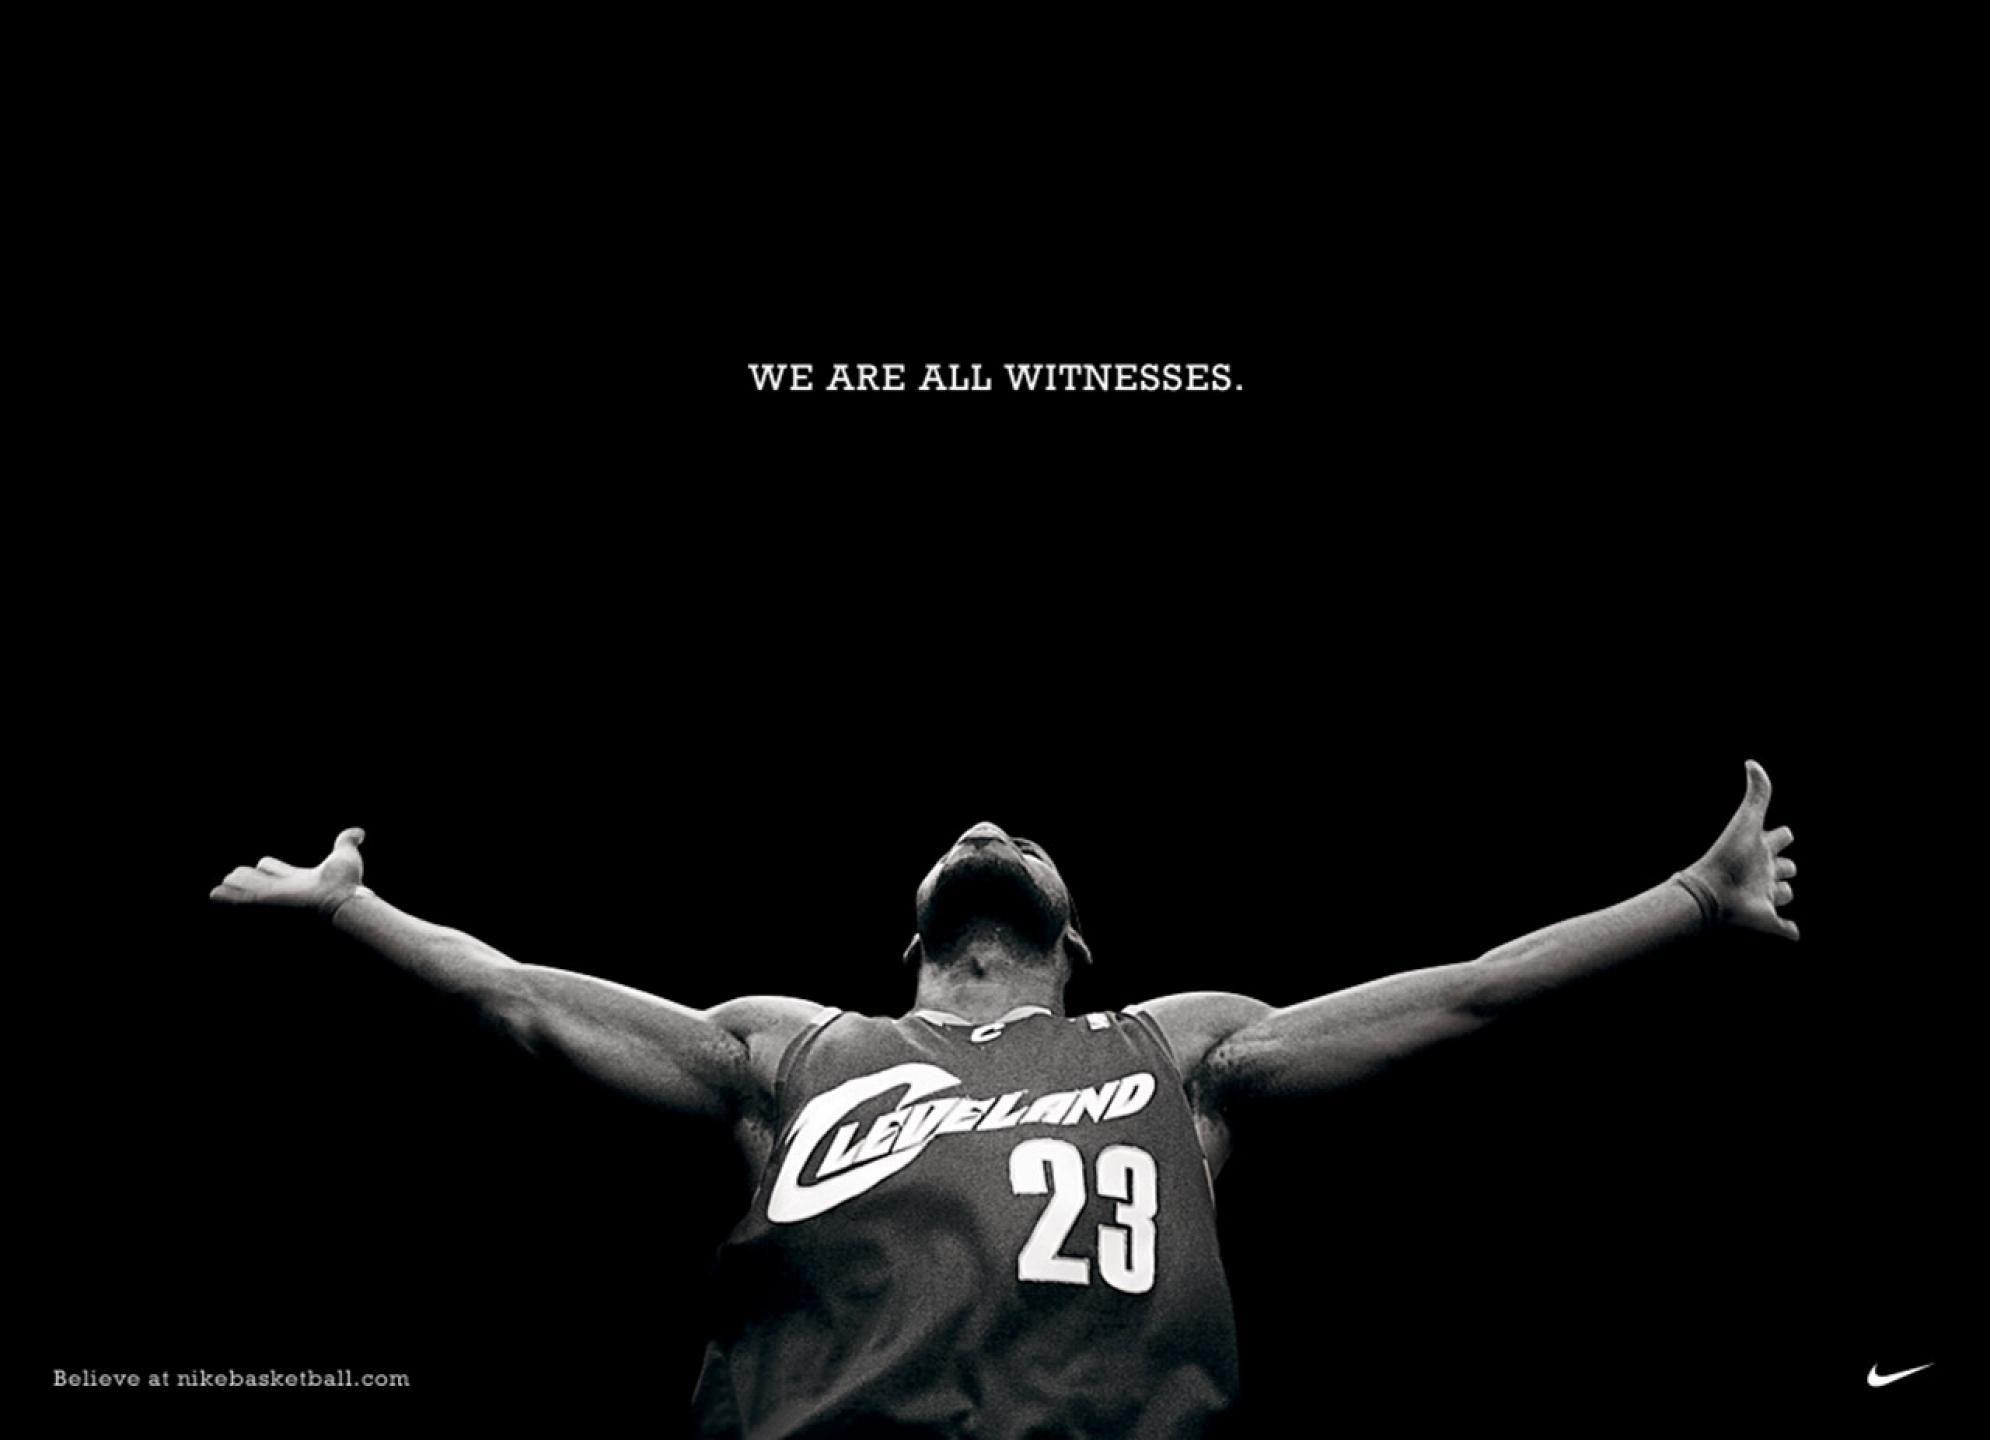 LeBron James Wallpaper We Are All Witnesses  25fcf5017